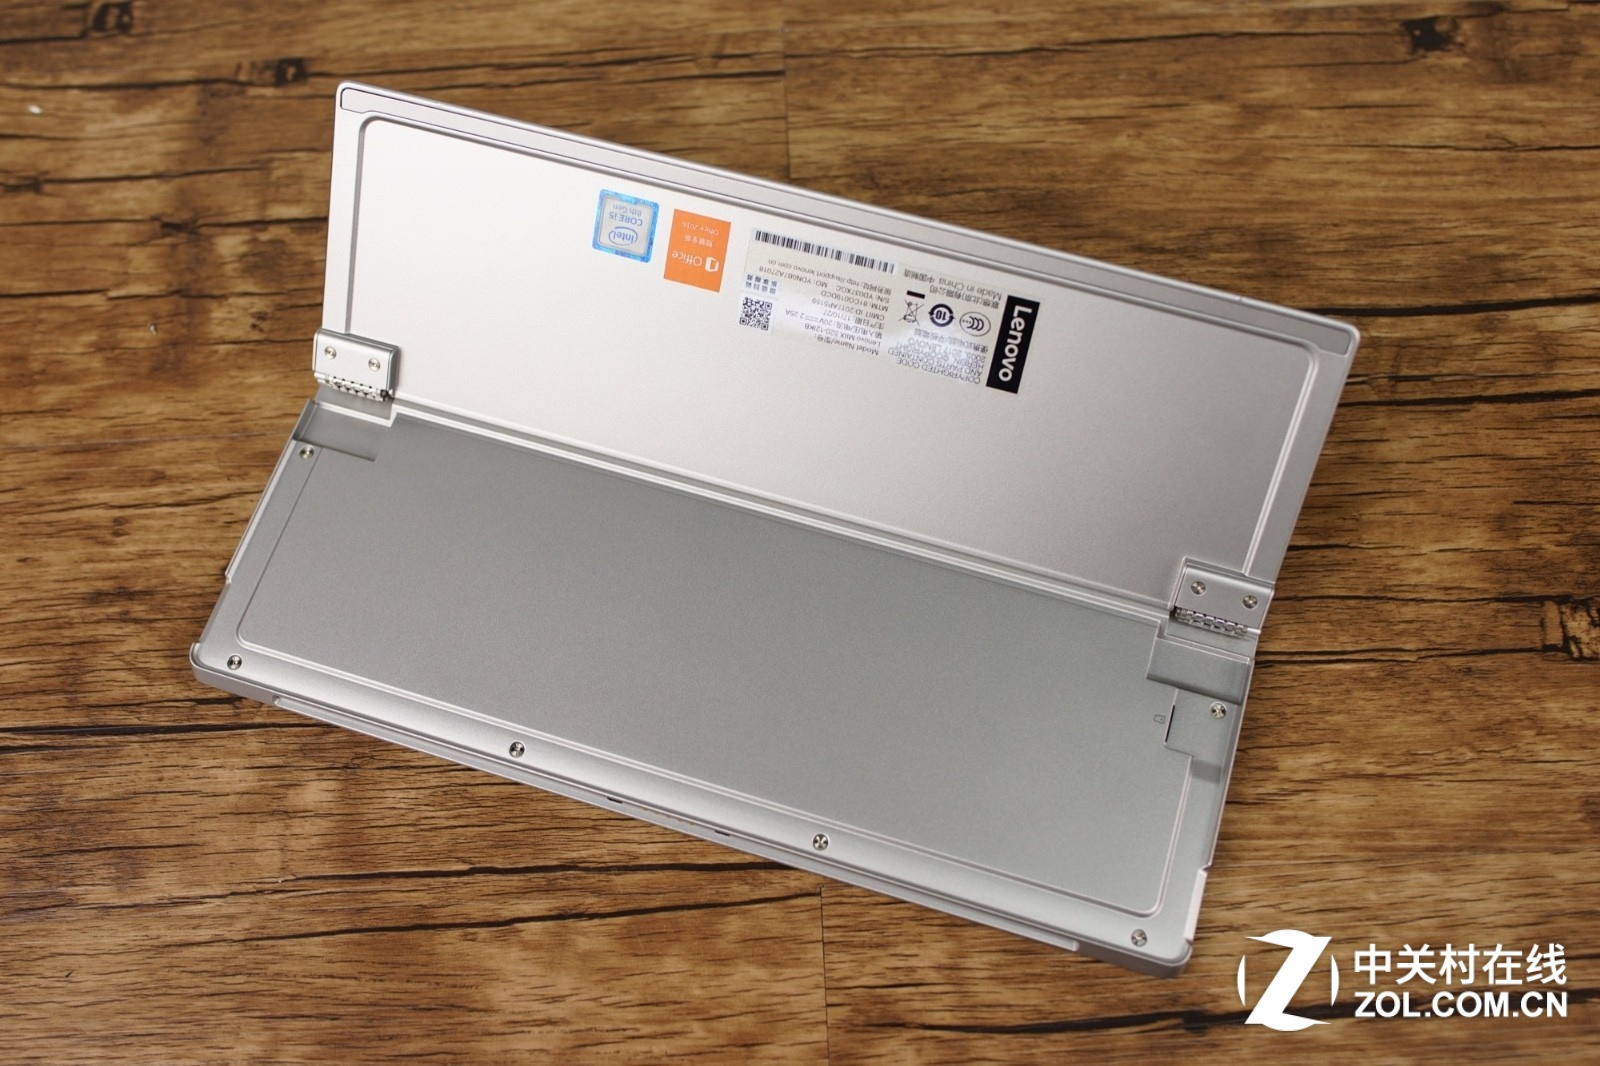 Lenovo Miix 520 Disassembly (SSD, RAM Upgrade Options